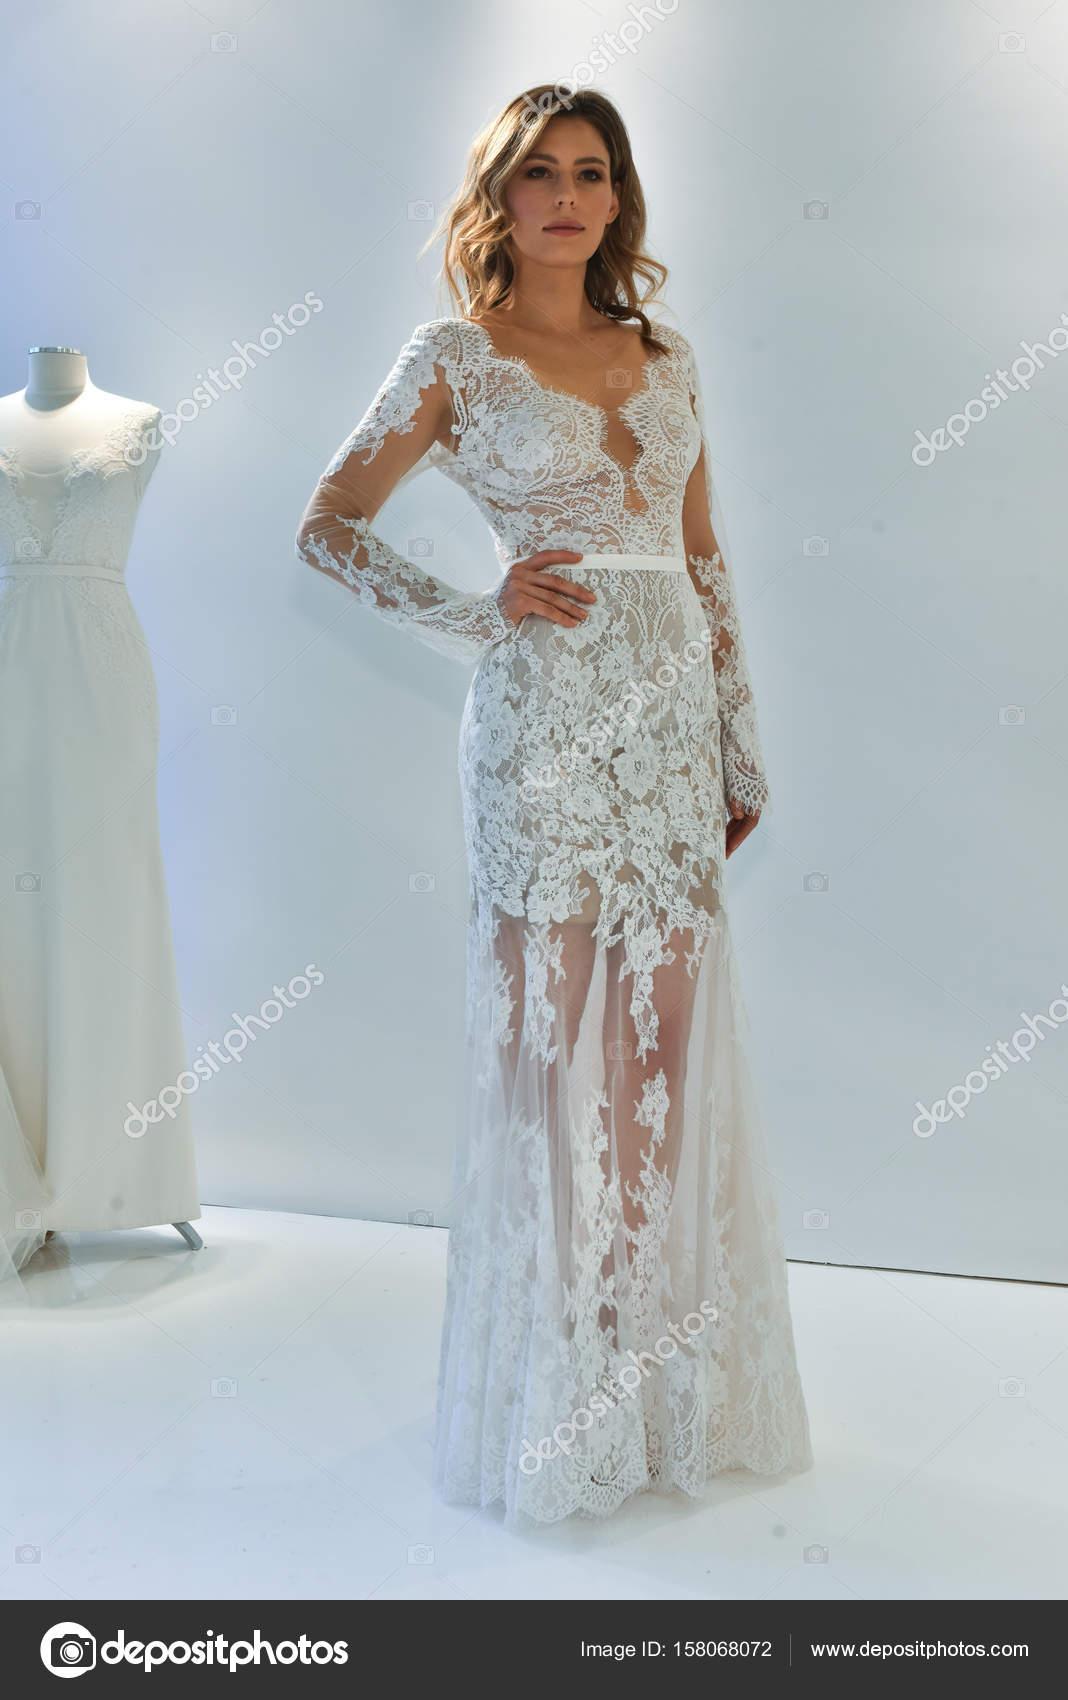 Fancy Jessica Mcclintock Bridal Gowns Motif - All Wedding Dresses ...